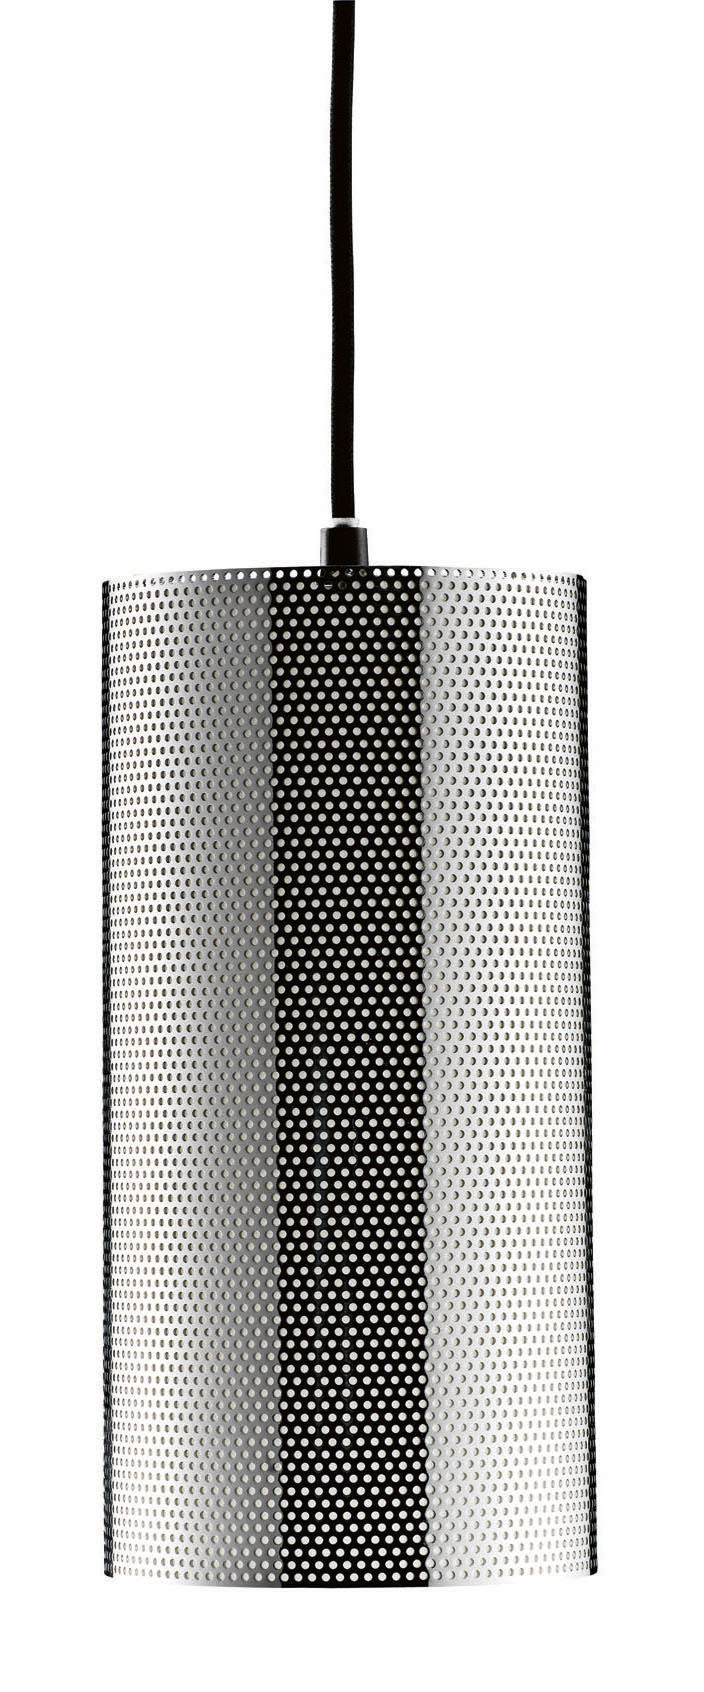 Leuchten - Pendelleuchten - Pedrera H2O Pendelleuchte Ø 13 x H 26 cm - Gubi - Metall - Metall, Polyäthylen